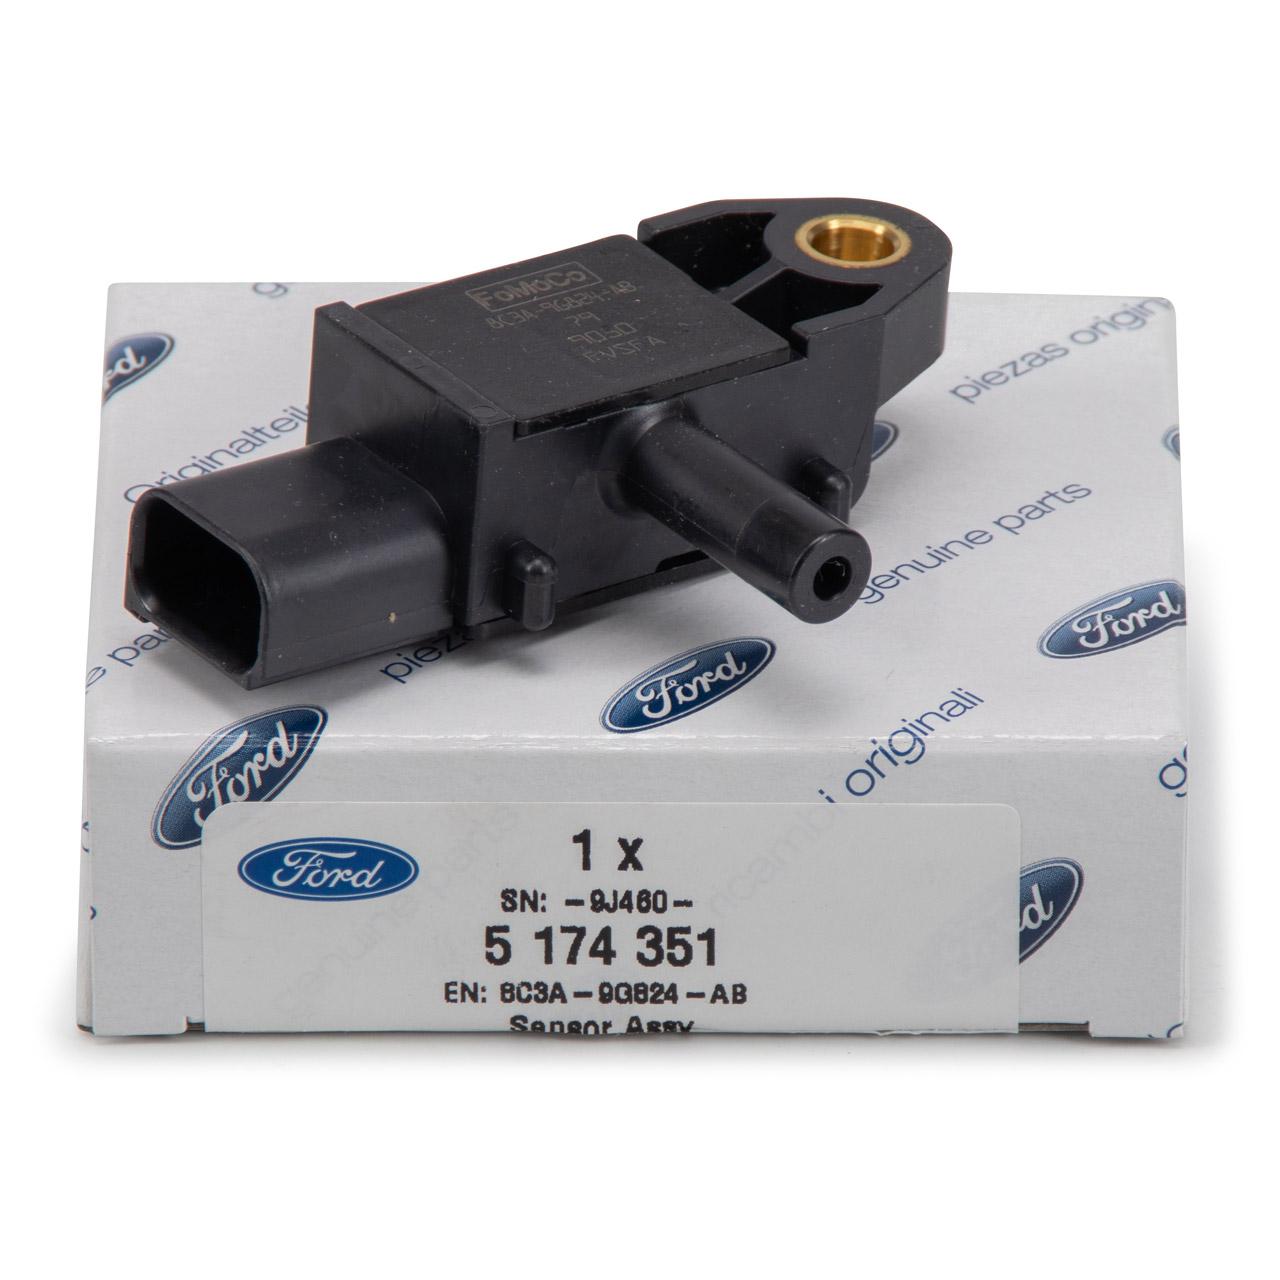 ORIGINAL Ford Differenzdrucksensor Abgasdrucksensor 1.5 / 1.6 TDCi 5174351